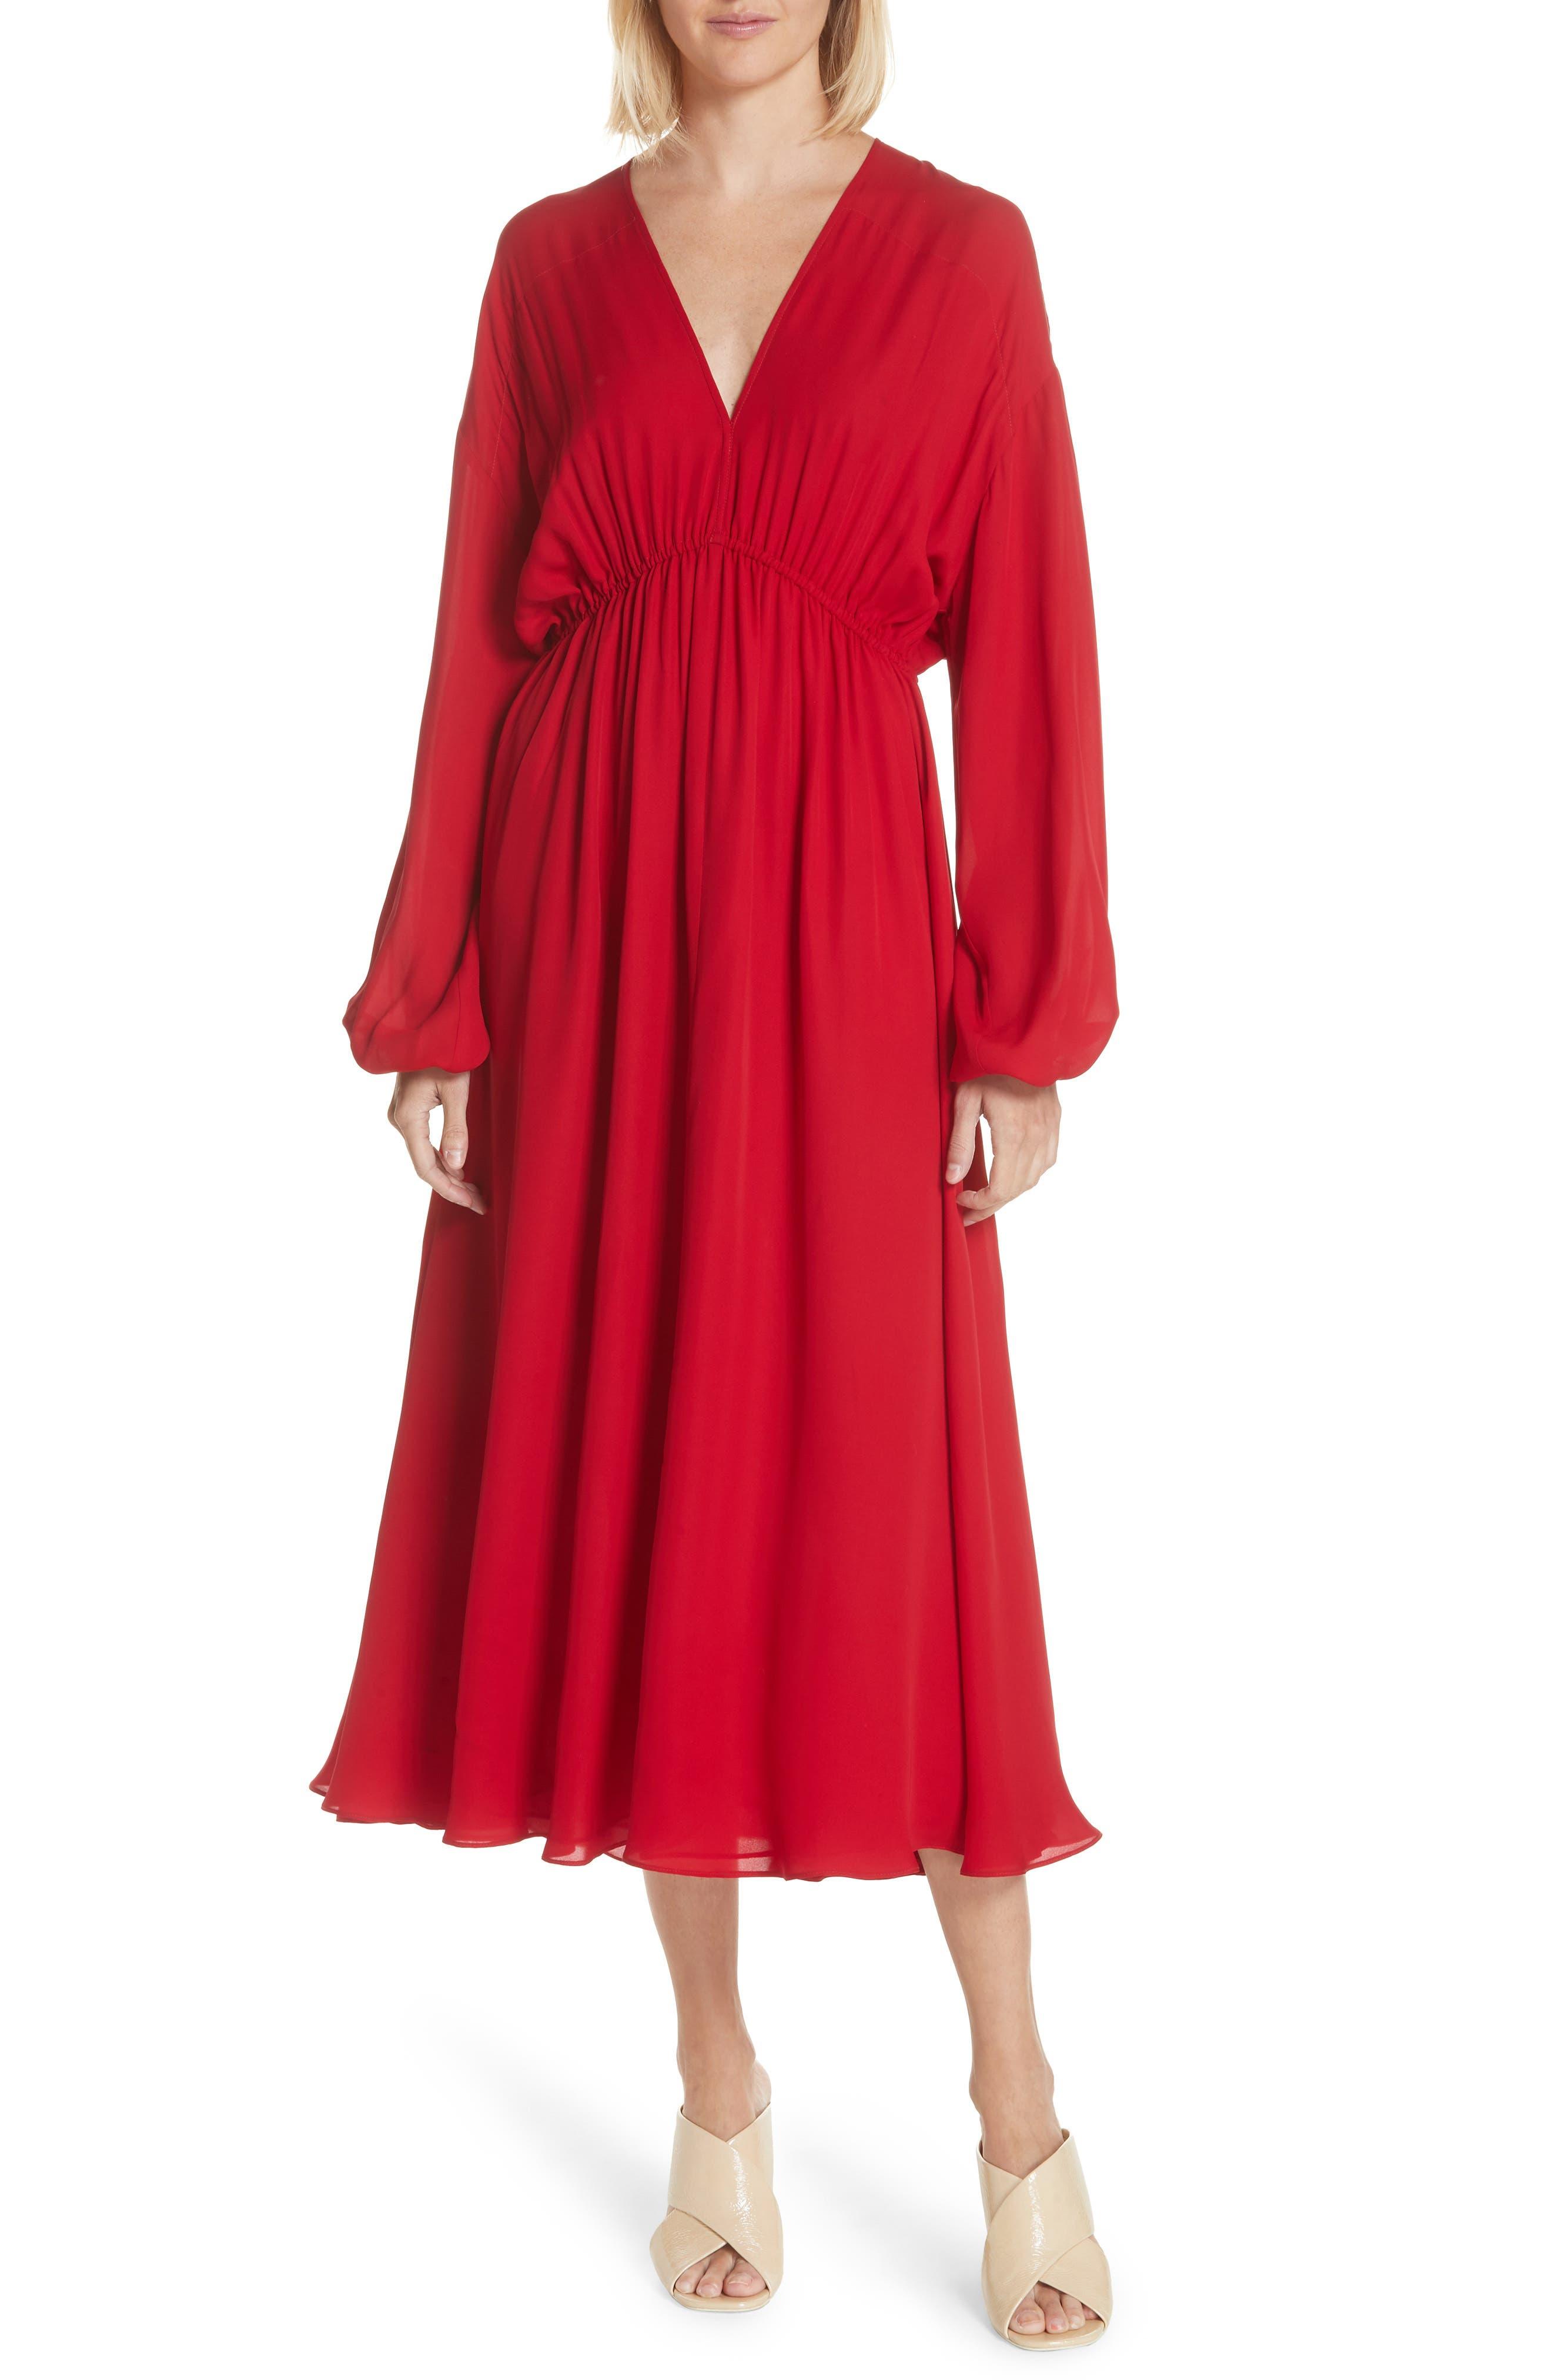 Elizabeth and James Norma Silk Dress